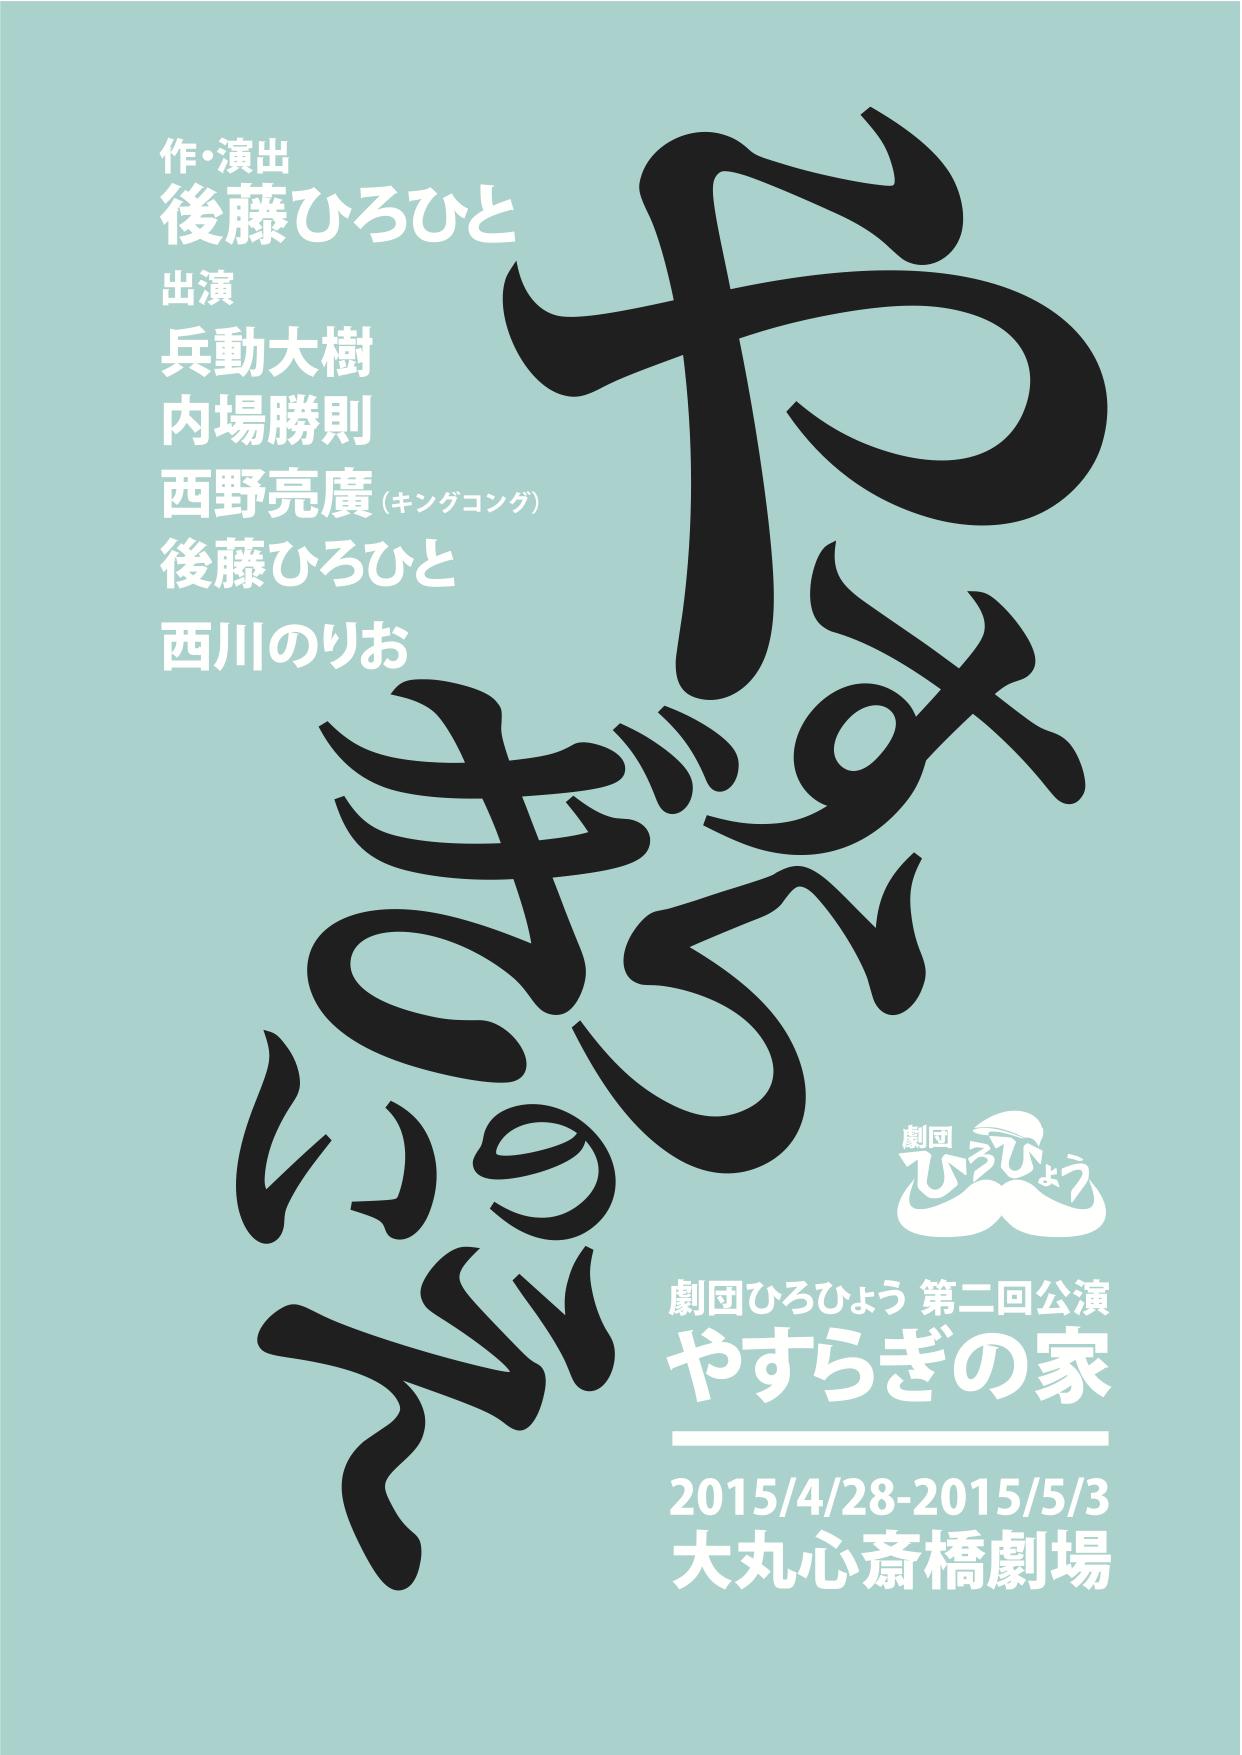 http://www.syumatsu.jp/photos/uncategorized/2015/04/16/20150416001726-994120f33439e1ca138bd3d2bed5438ae41ebf3d.jpg